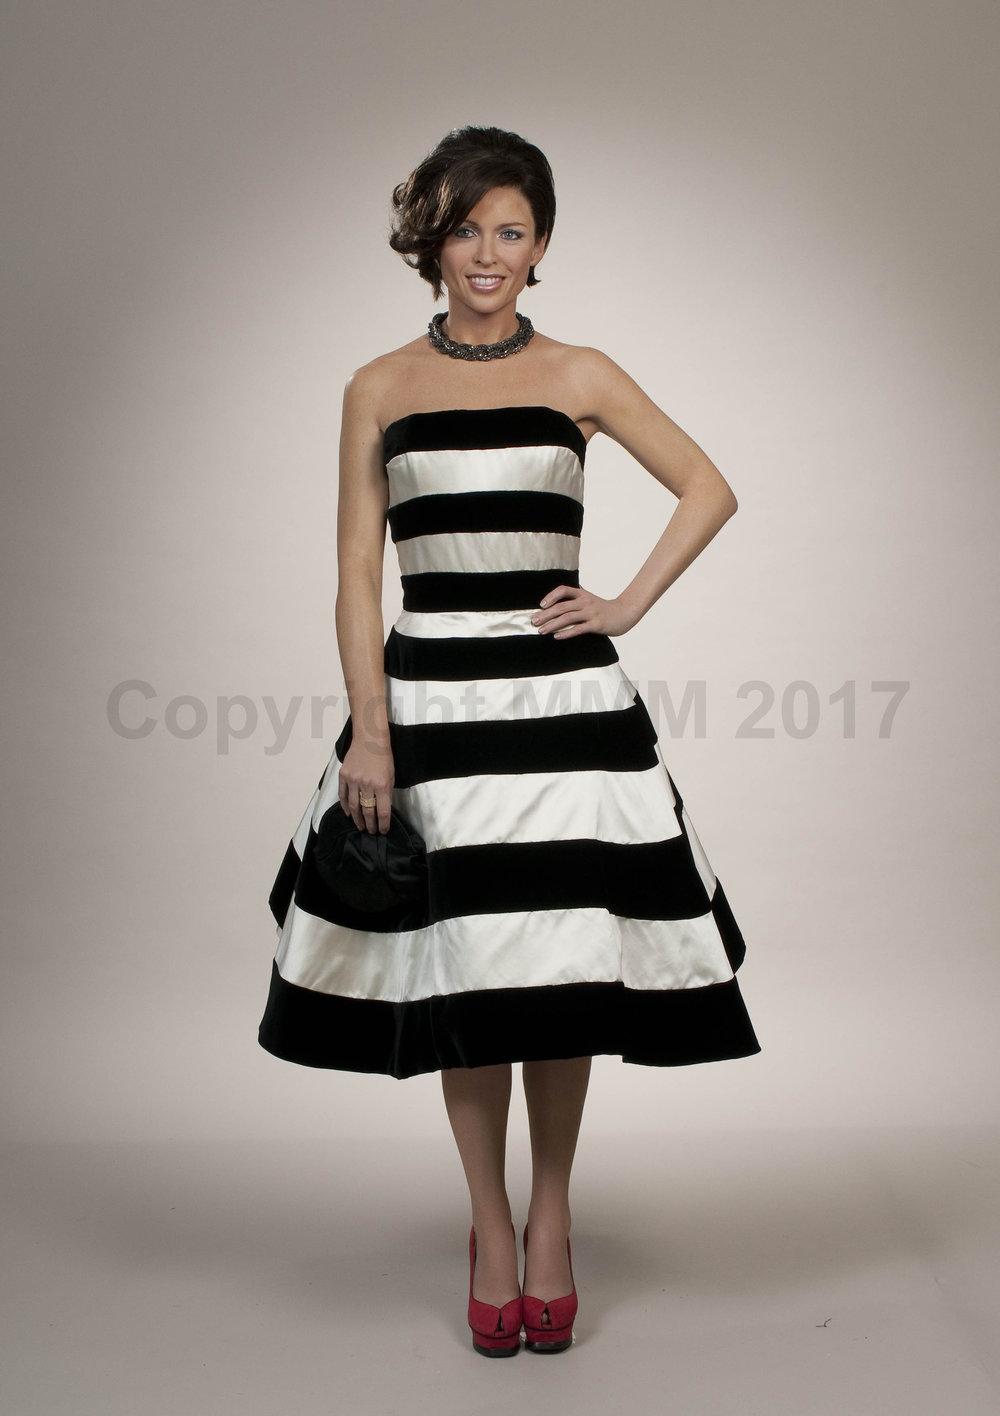 _DSC6116 - Dannii Minogue MTSYD 2011.JPG